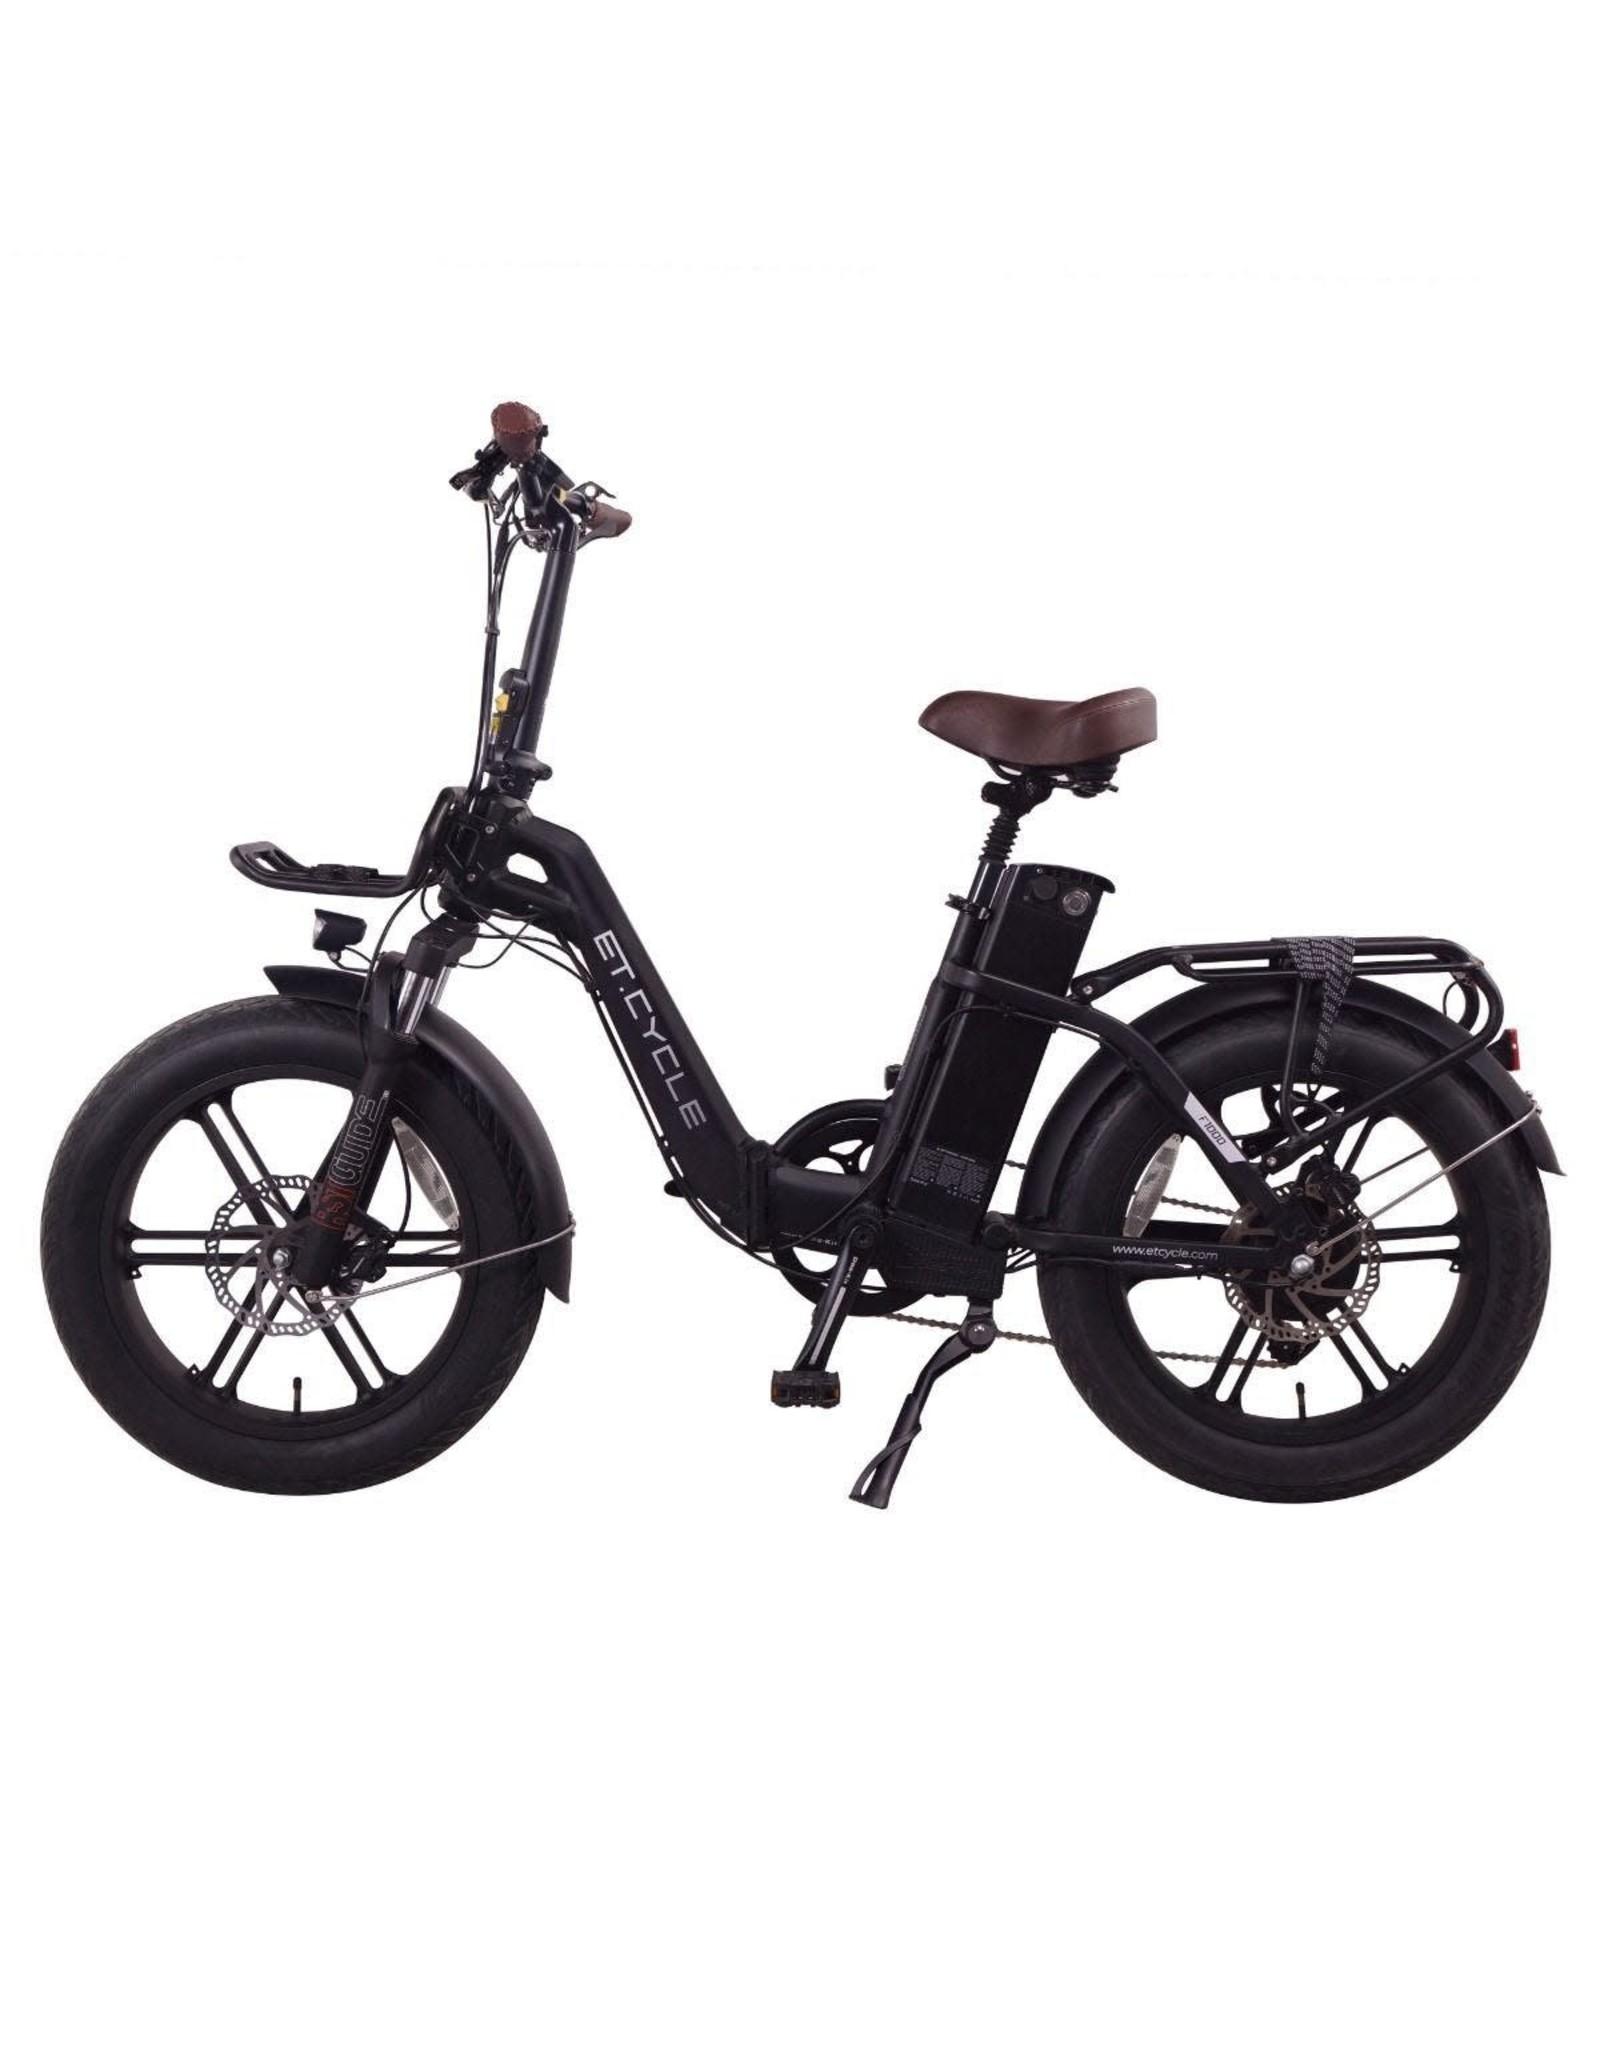 LEON CYCLE ET.Cycle F1000 Electric Fat Bike black 20''